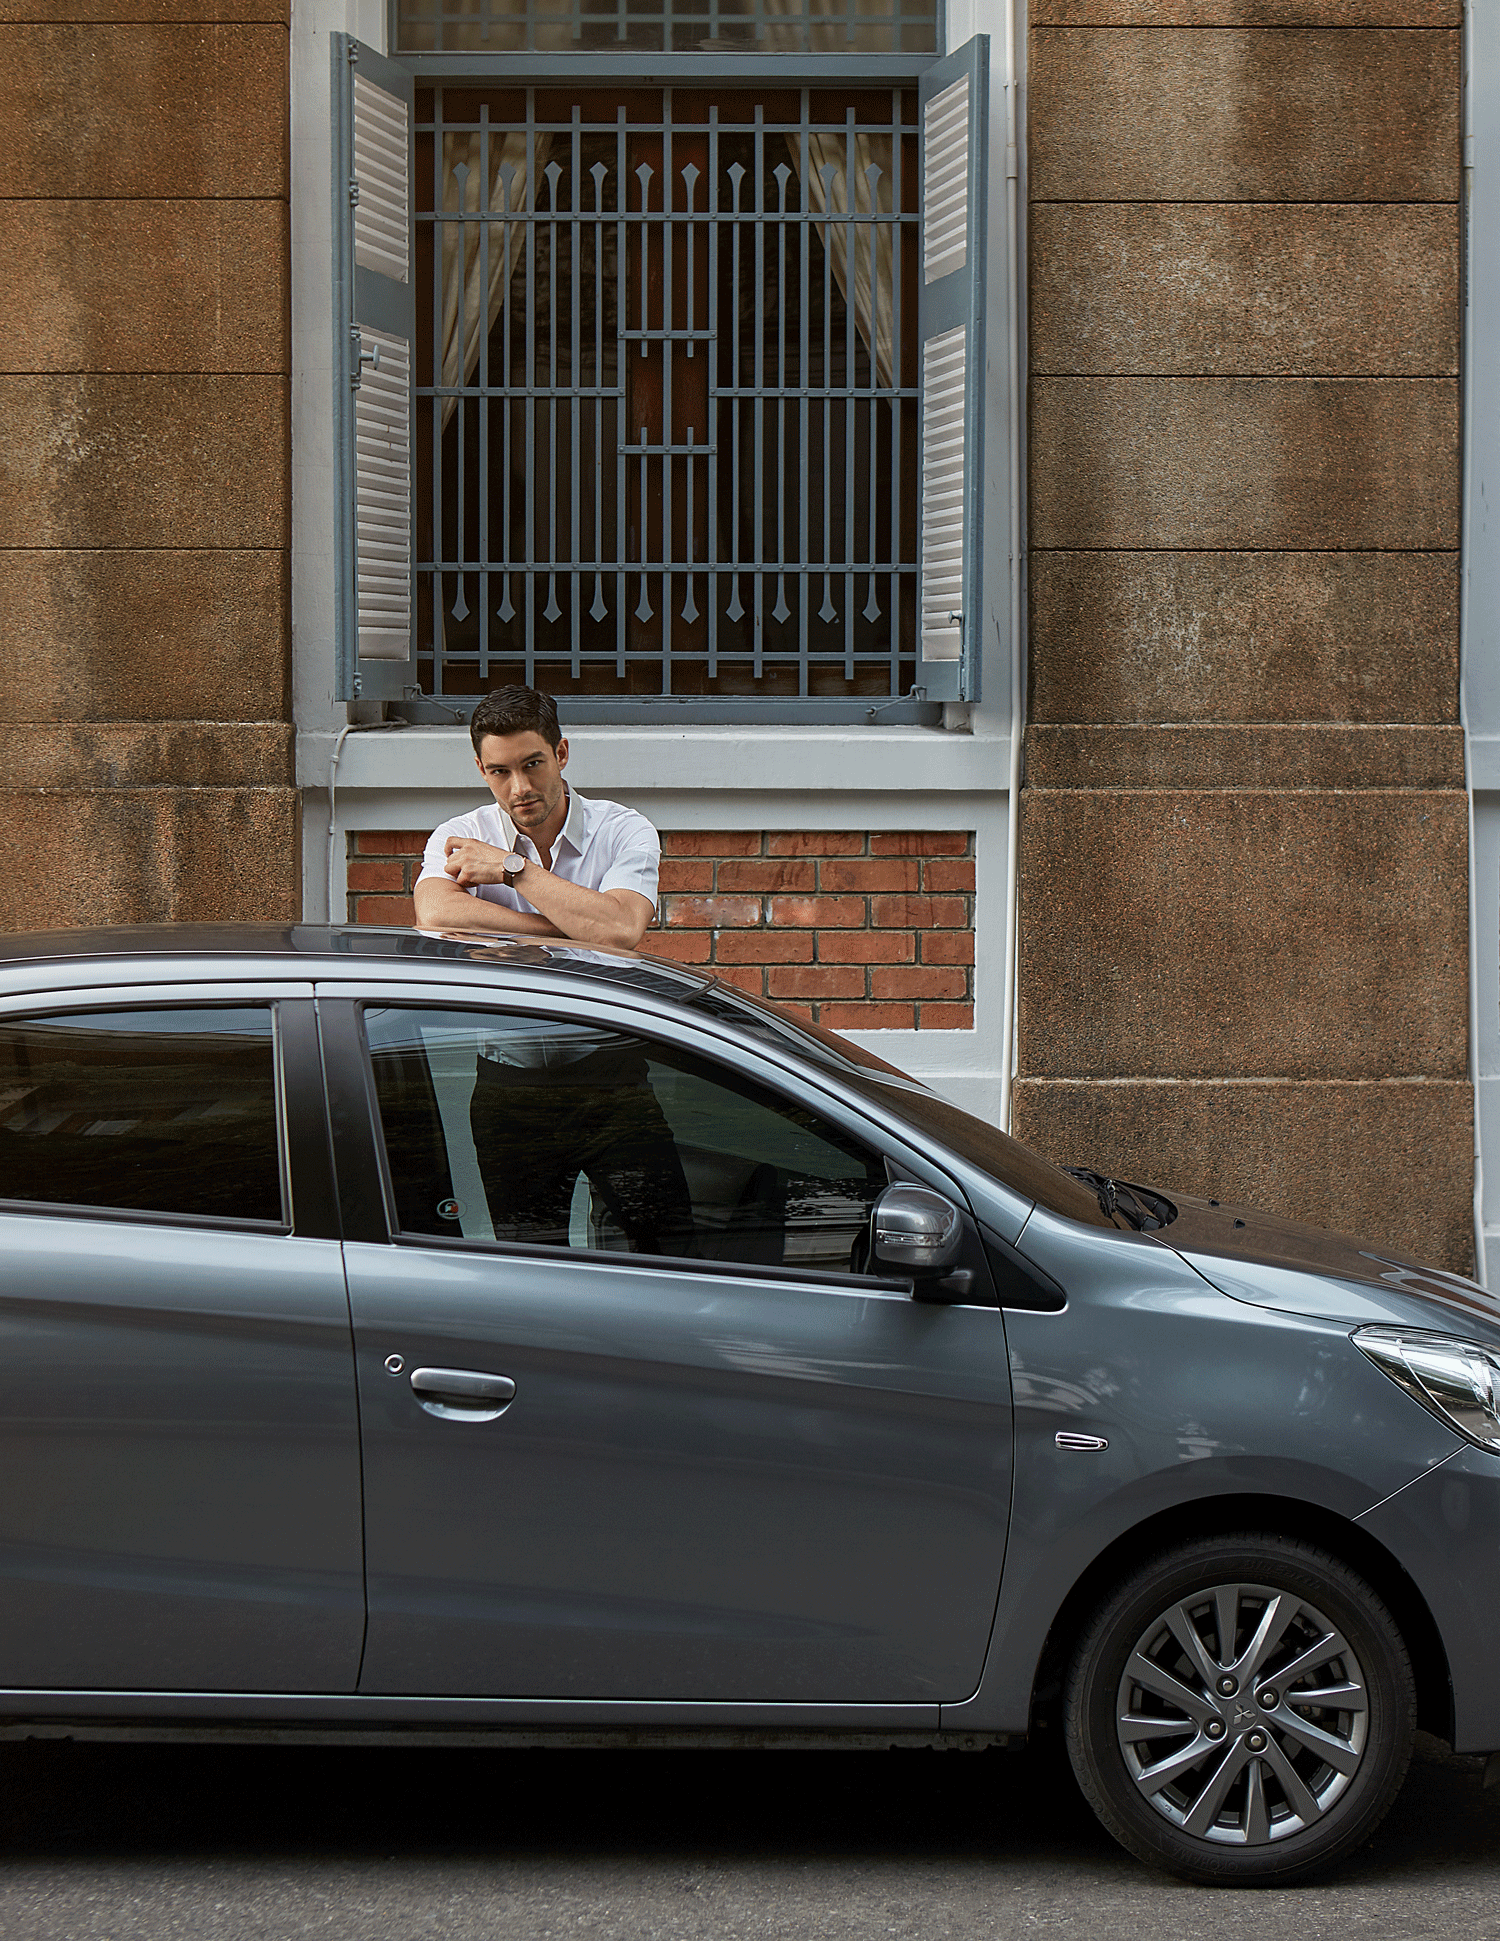 car : Mitsubishi NEW Attrage  shirt : Jil Sander / watch : FORREST